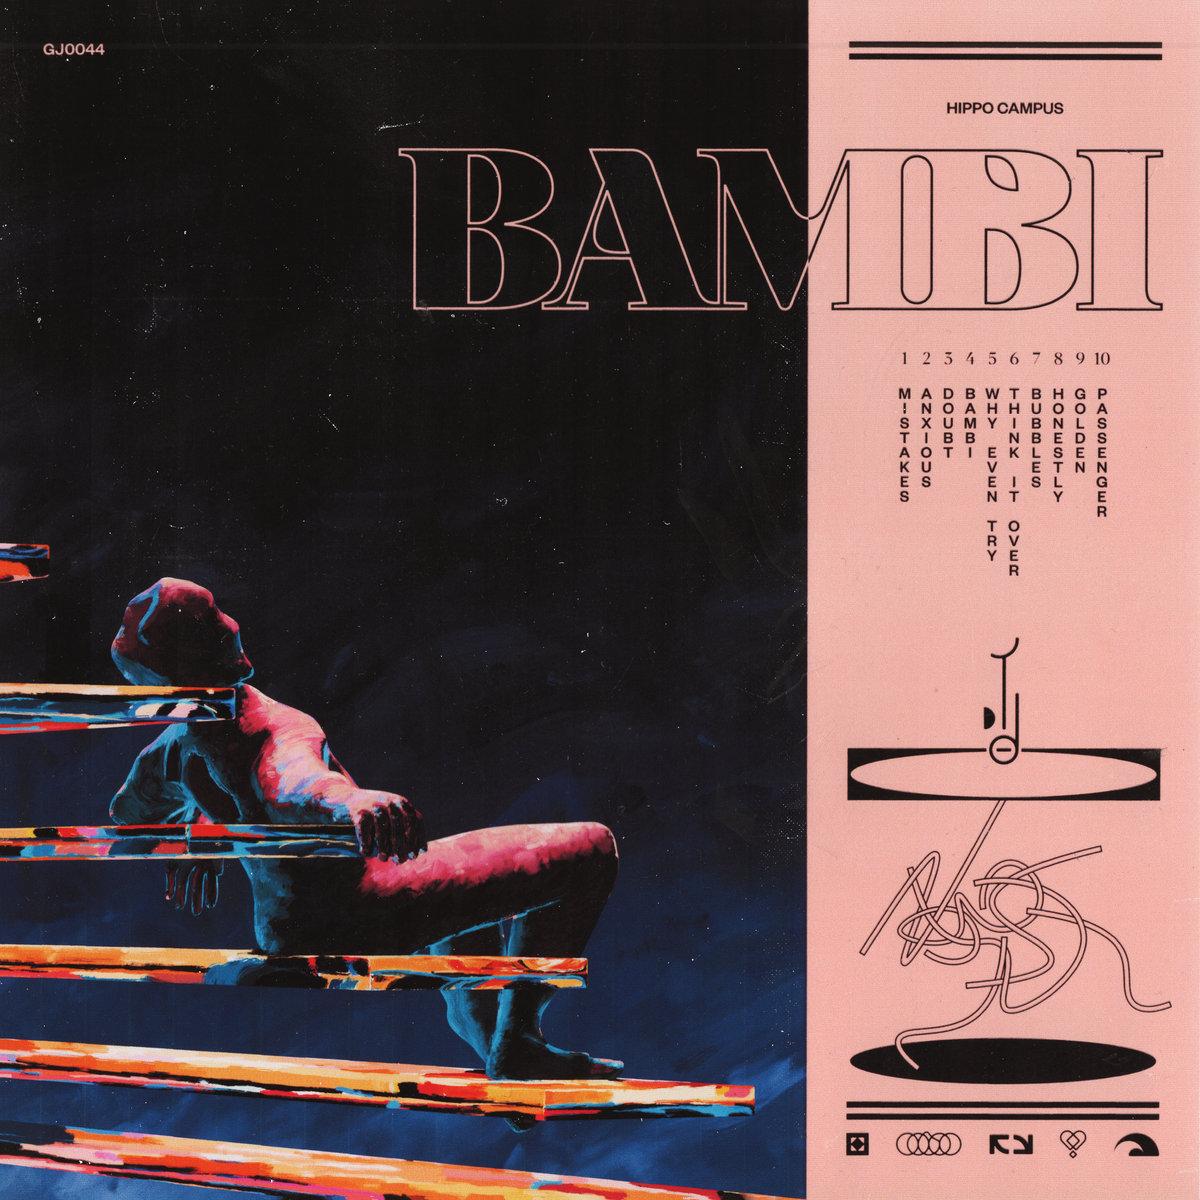 Bambi album cover art.